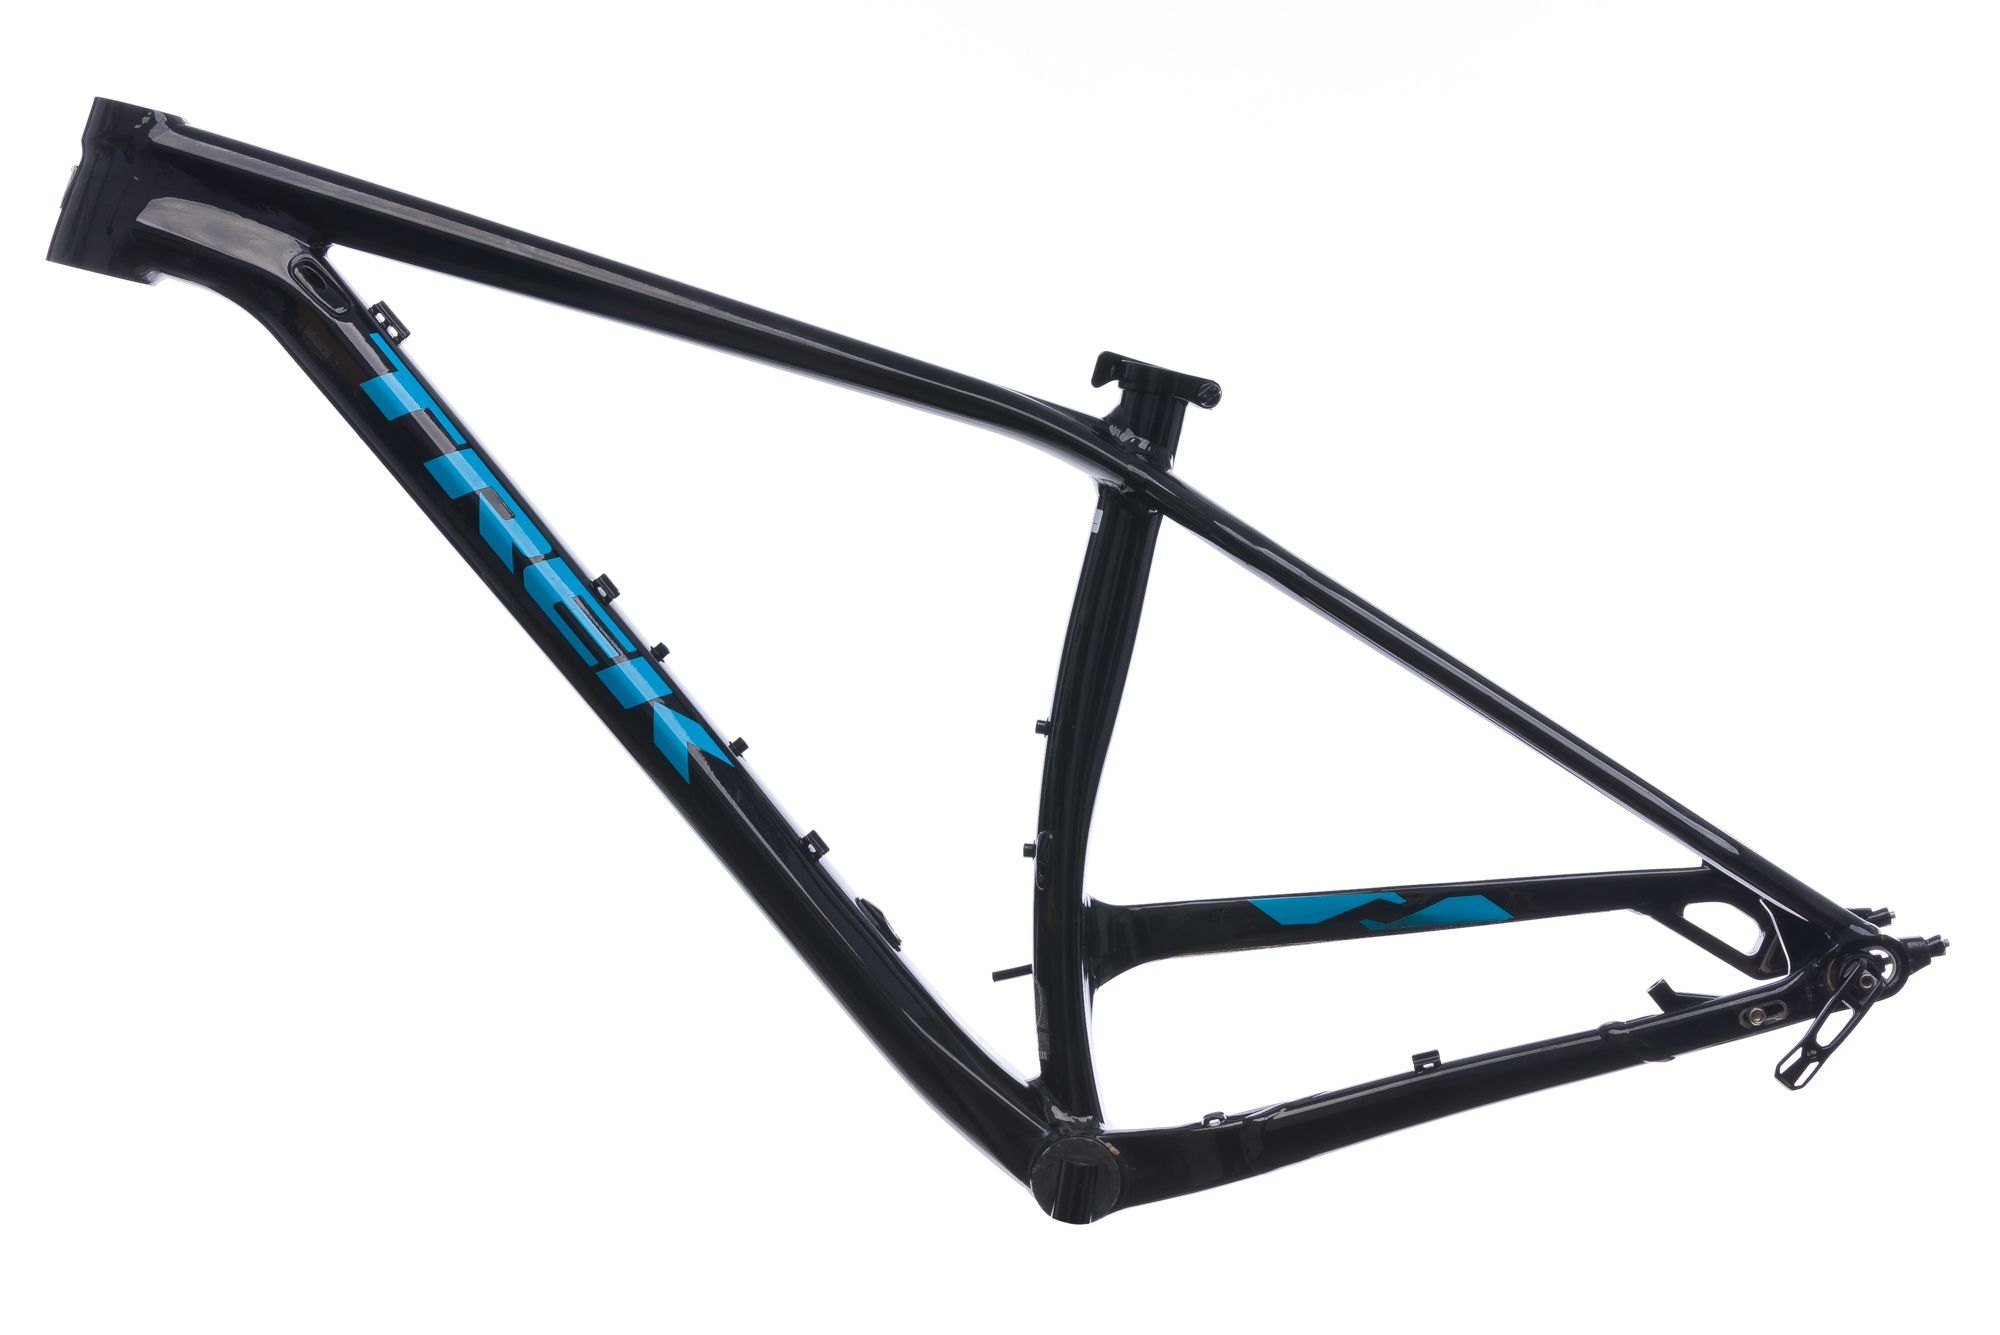 2017 Trek Stache 5 Mountain Bike Frame 17.5in MEDIUM 29\